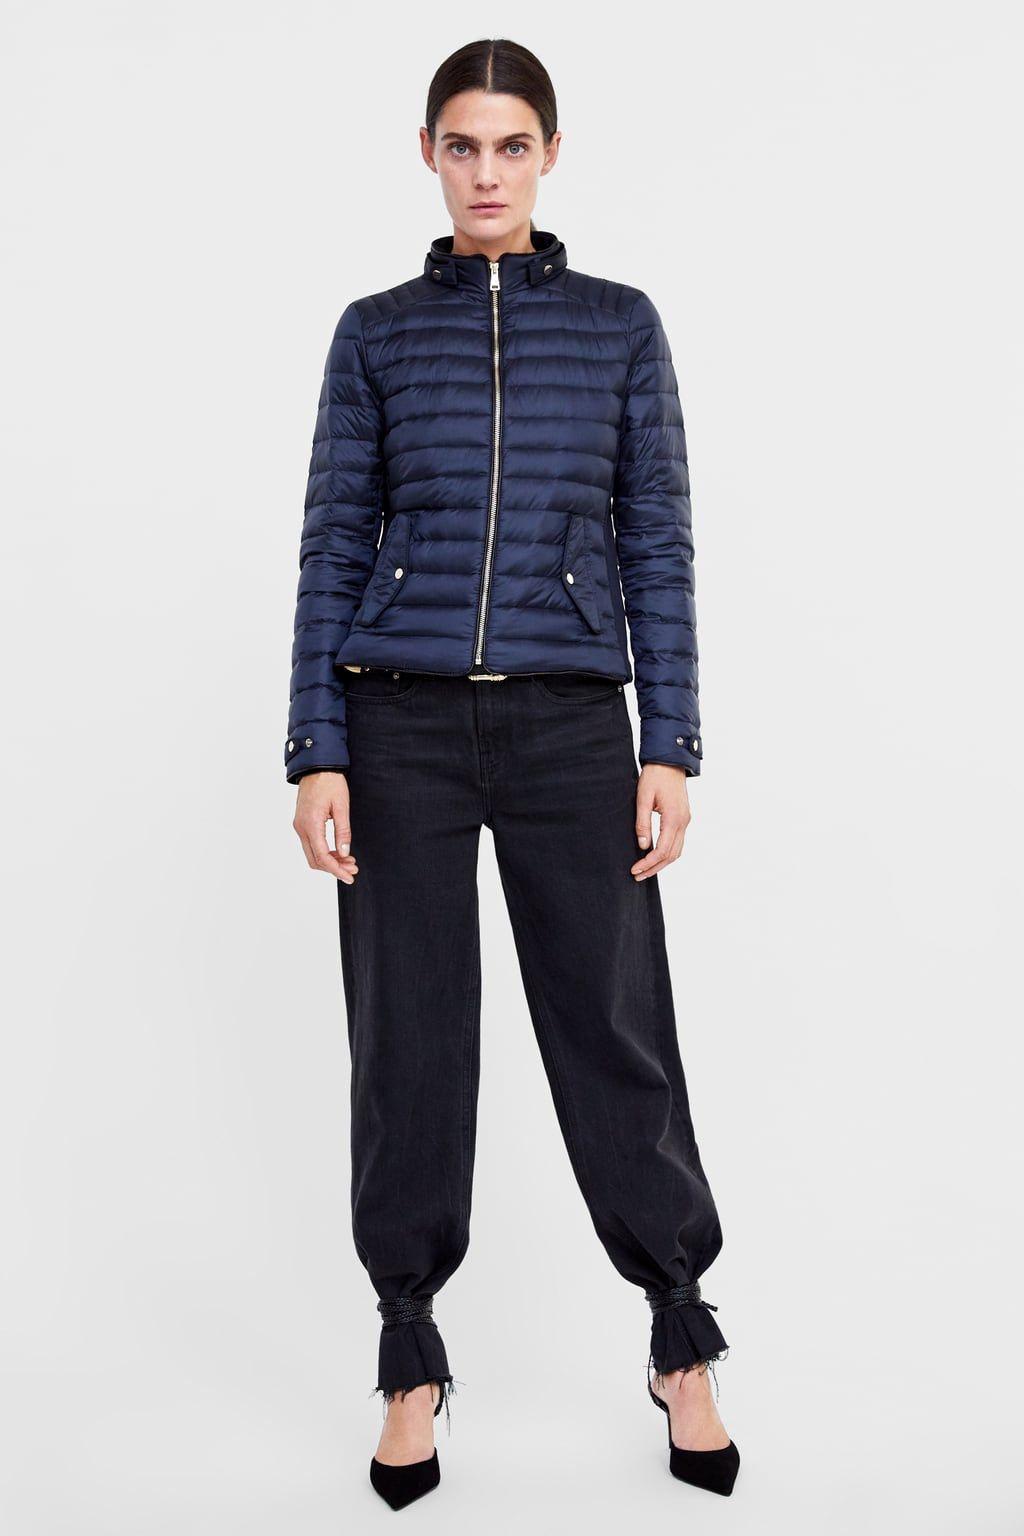 Image 5 Of Lightweight Down Puffer Jacket From Zara Down Jacket Jackets Pantsuit [ 1536 x 1024 Pixel ]